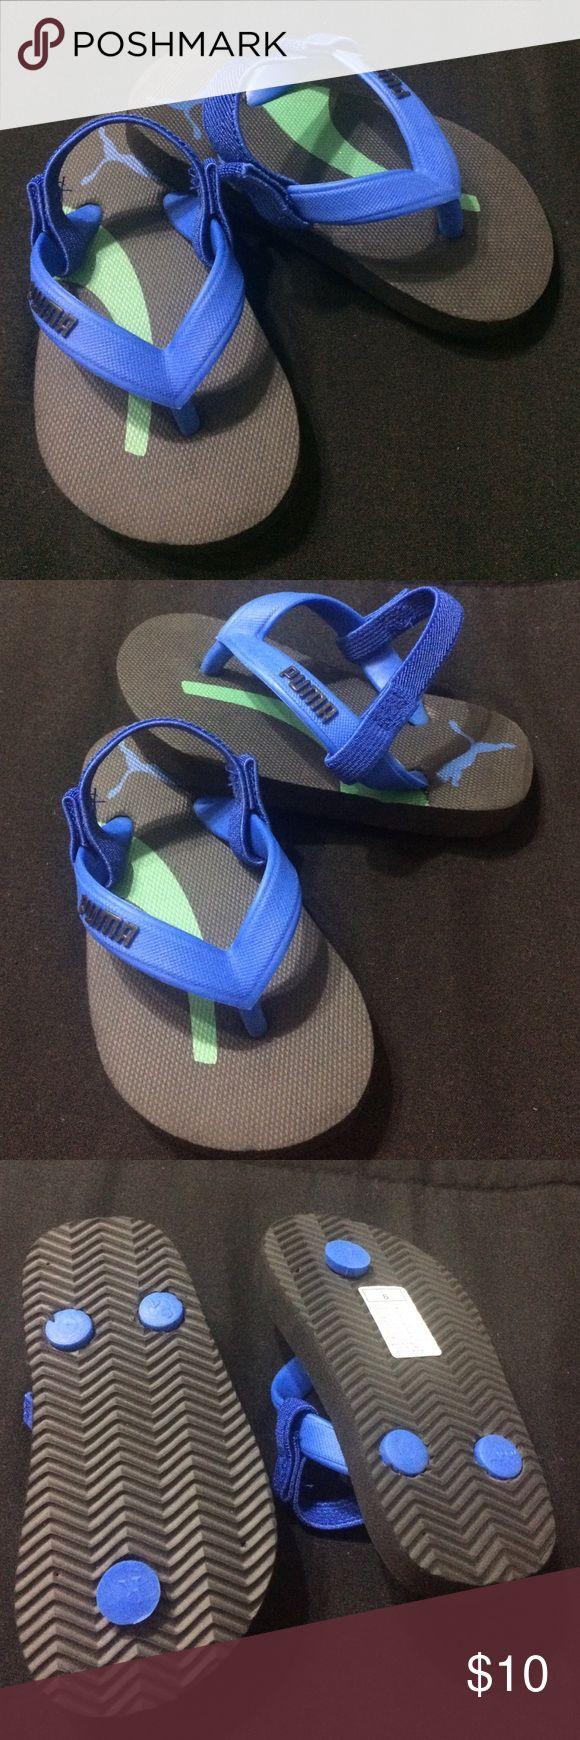 Baby PUMA sandals Beautiful  Puma Sandals (nwot) Puma Shoes Sandals & Flip Flops